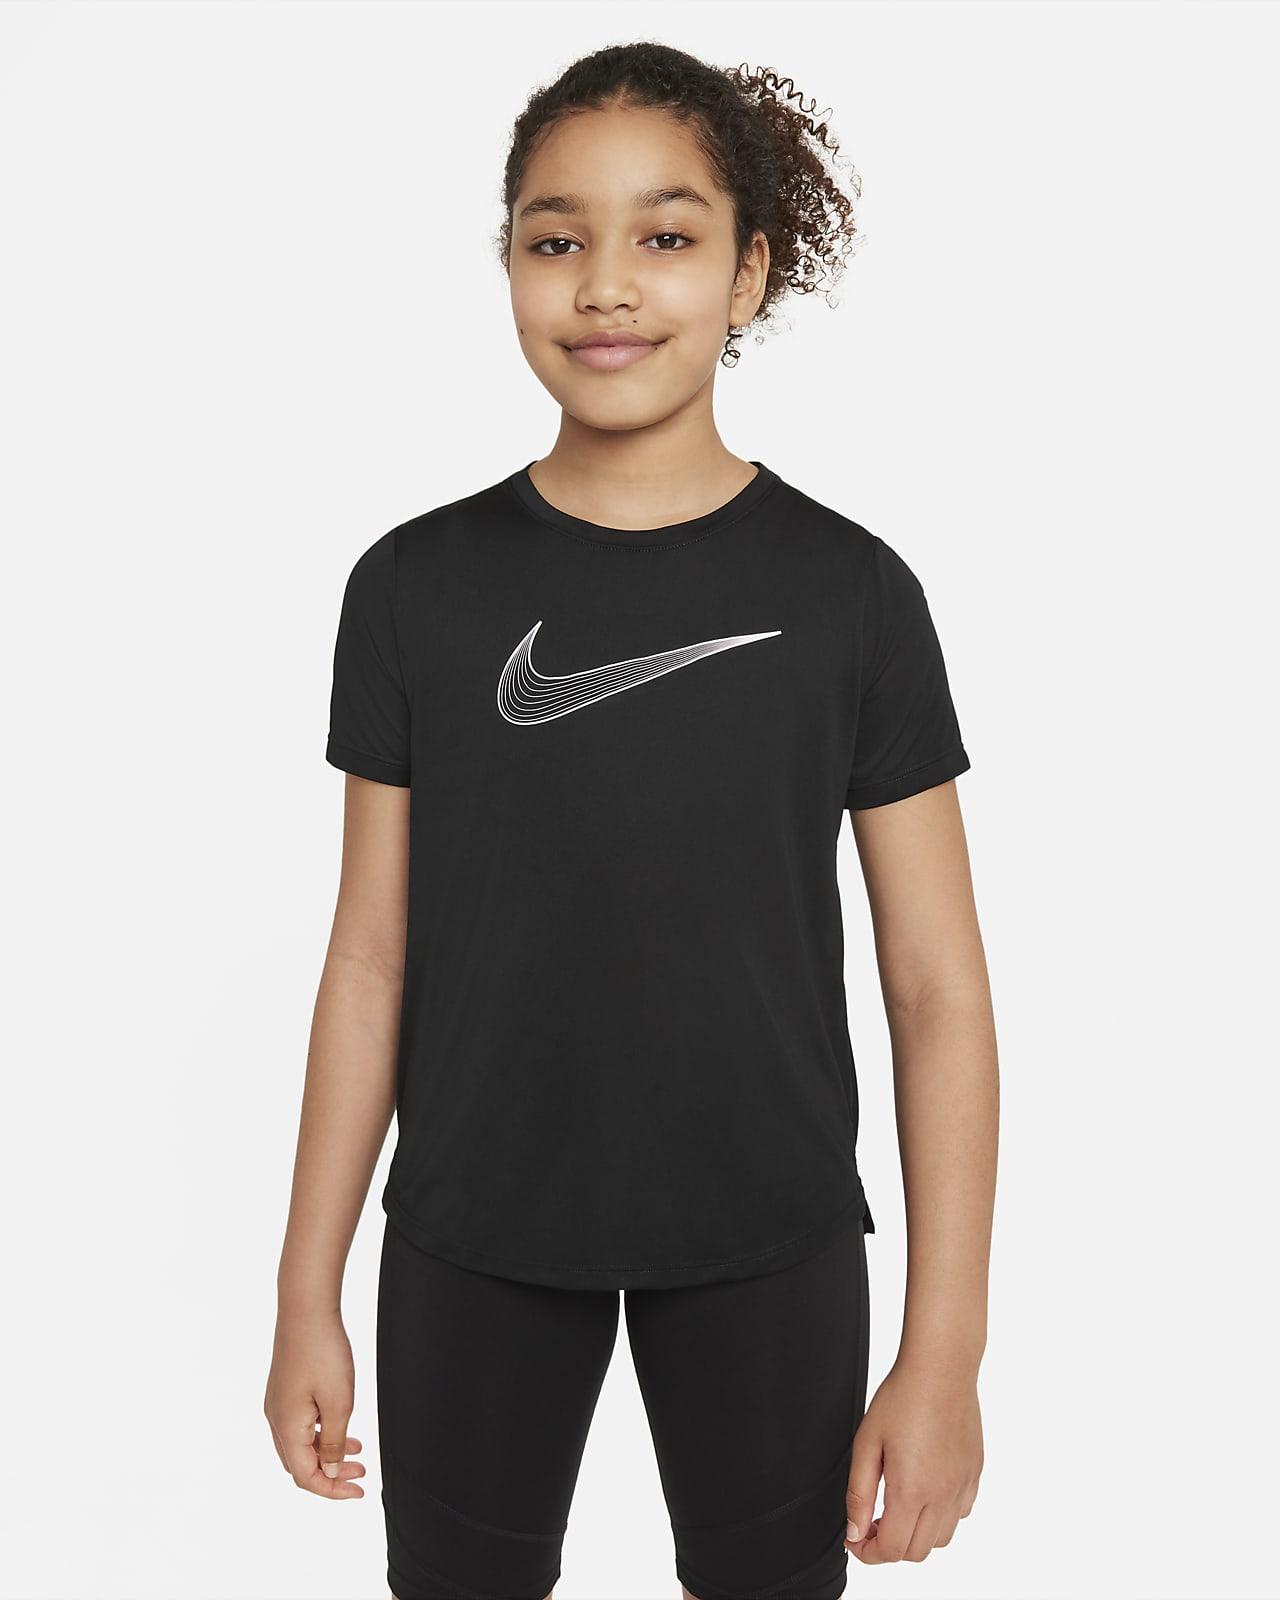 Nike Dri-FIT One 大童 (女童) 短袖訓練上衣